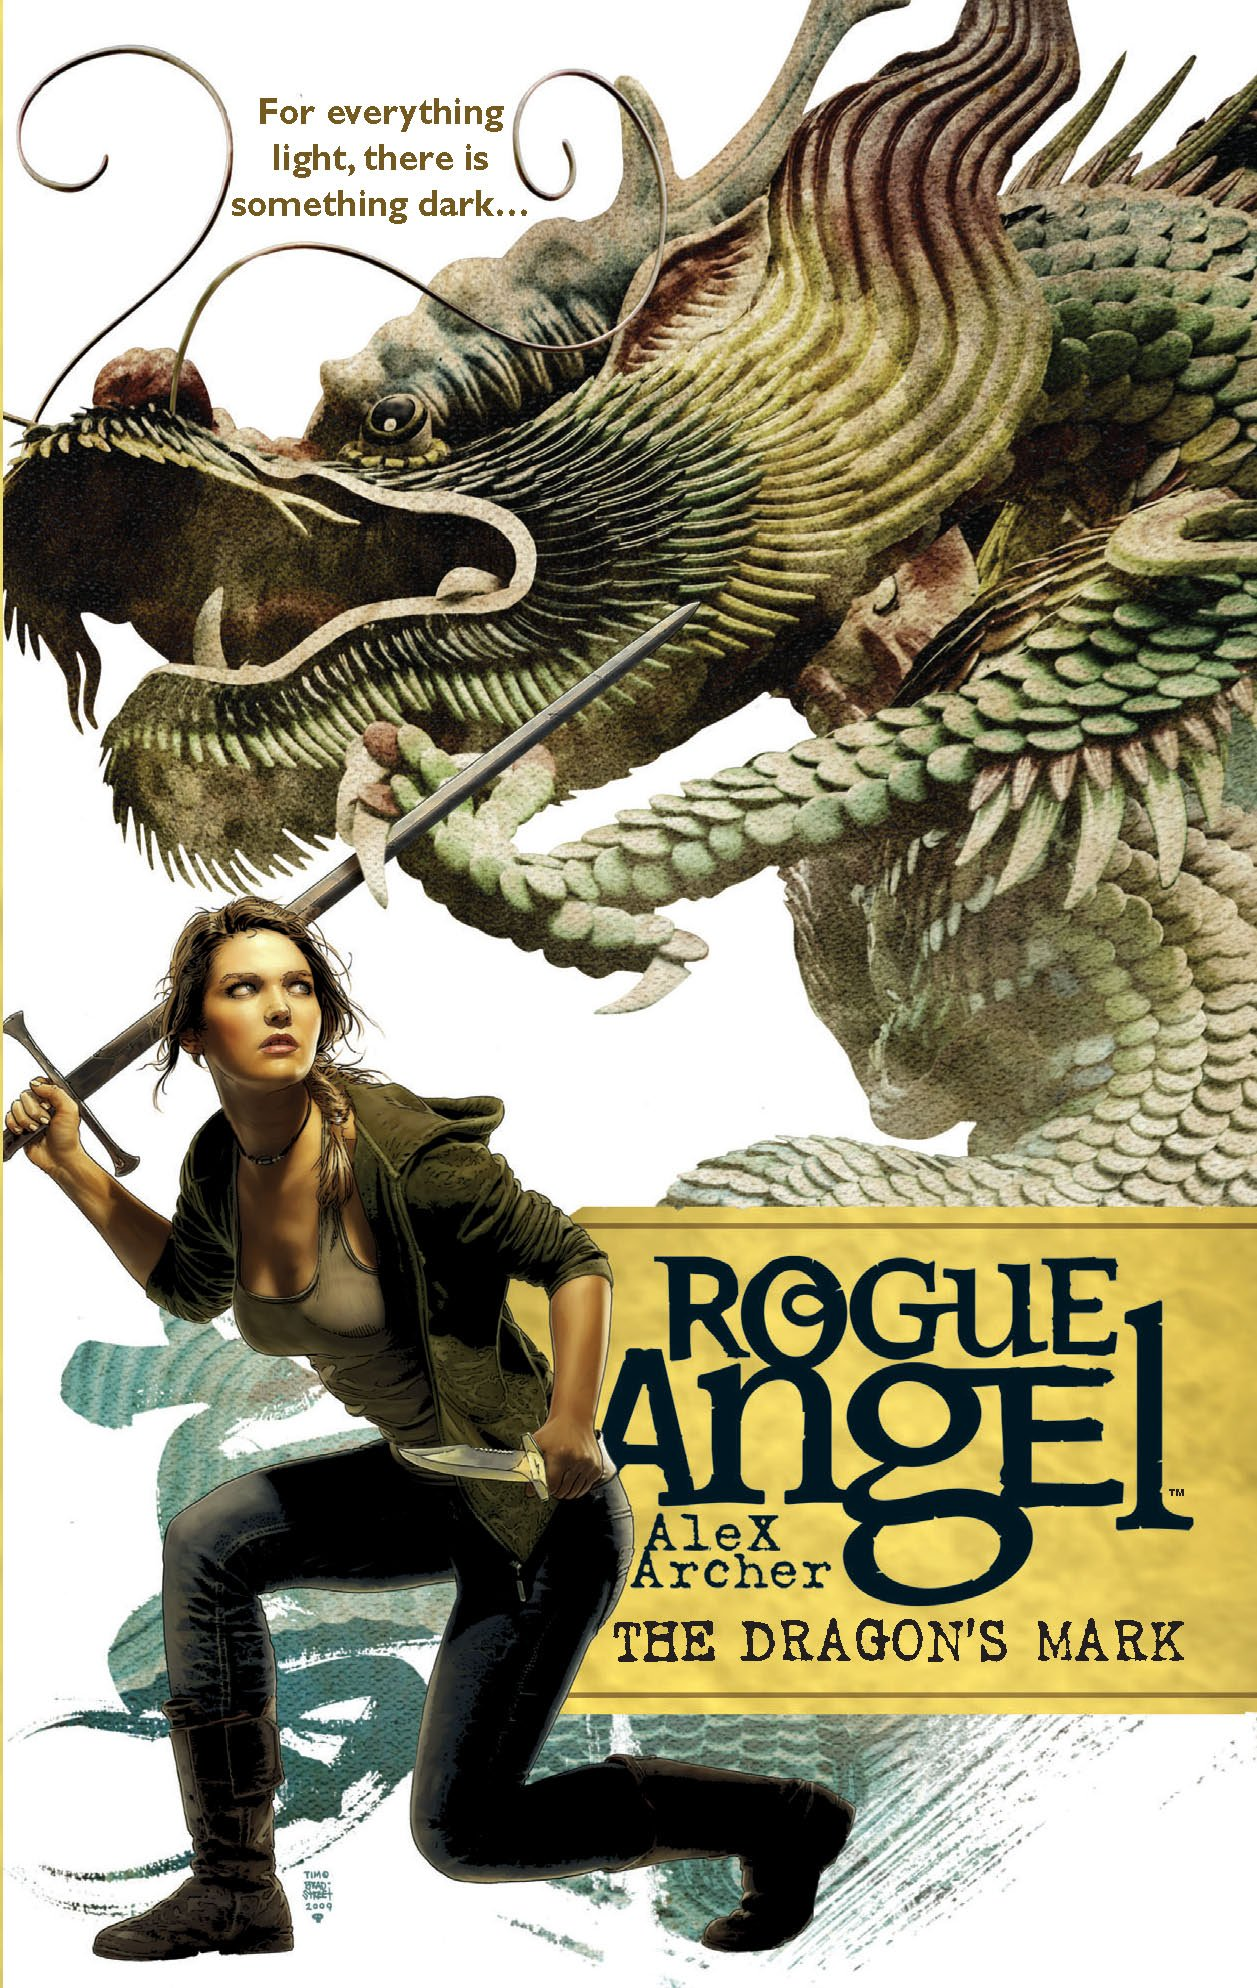 Amazon.com: The Dragon's Mark (Rogue Angel) (9780373621453): Alex Archer:  Books